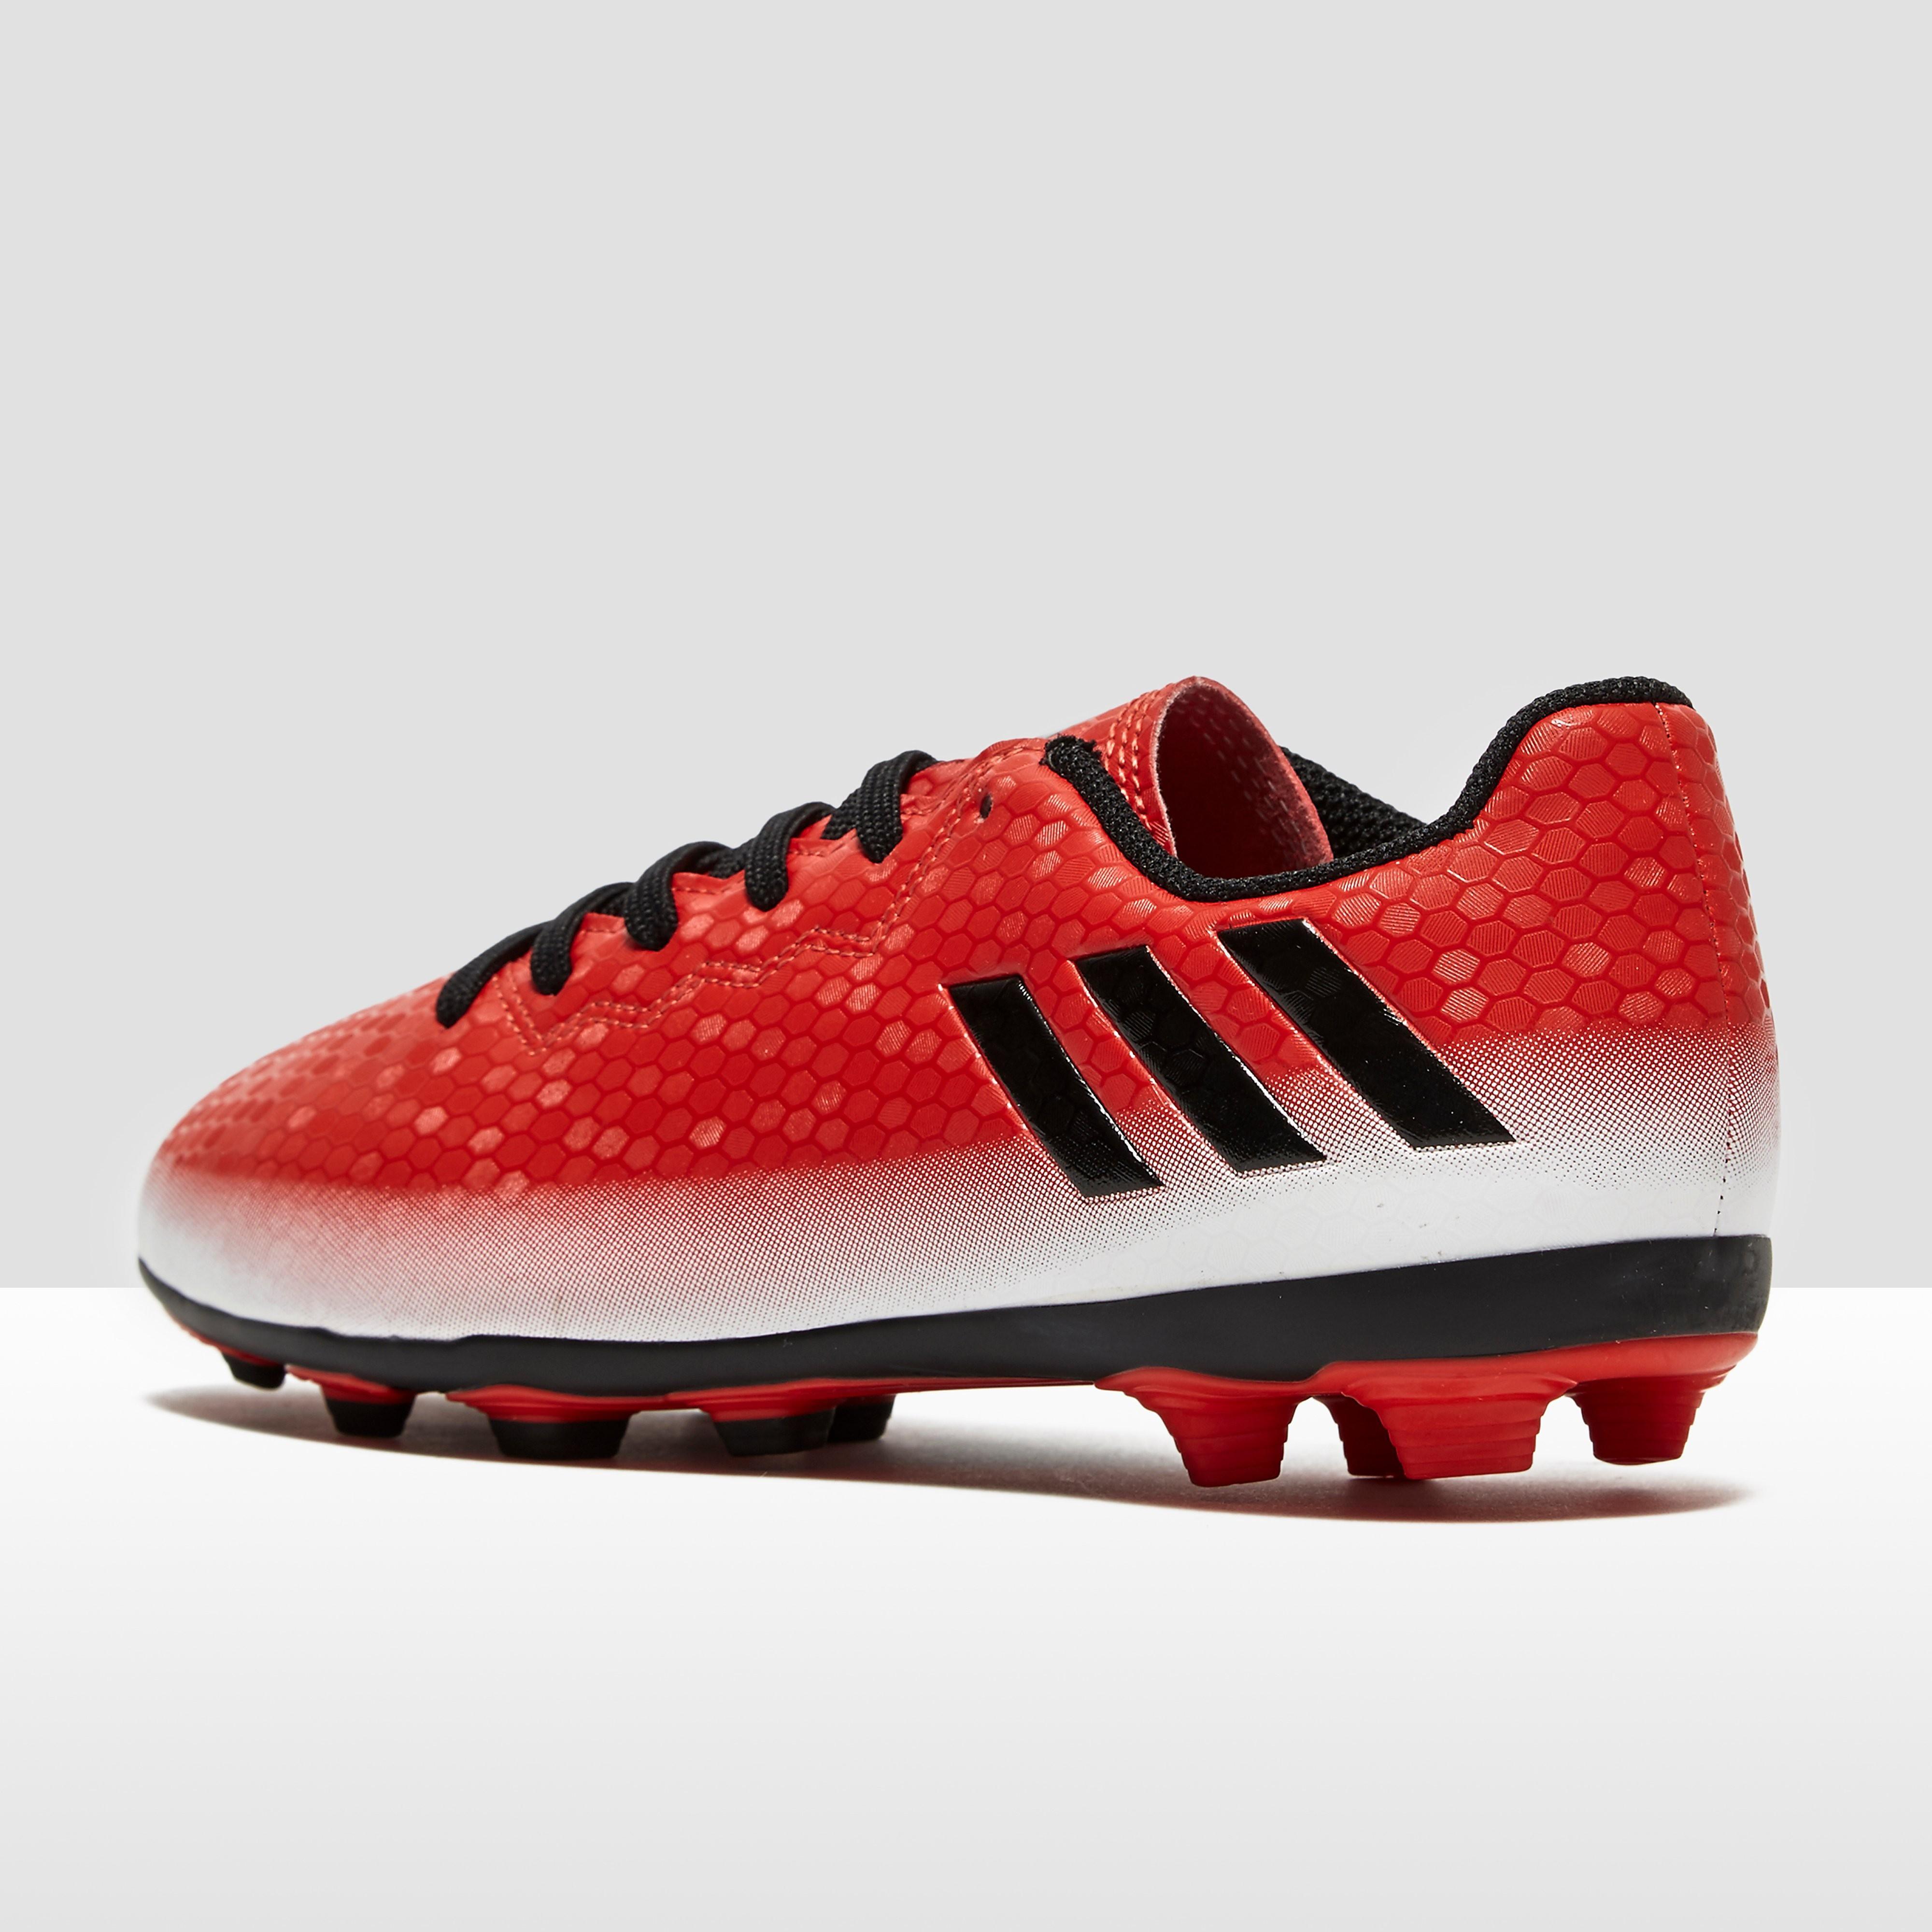 adidas Children's Messi 16.4 Firm Ground Football Boots